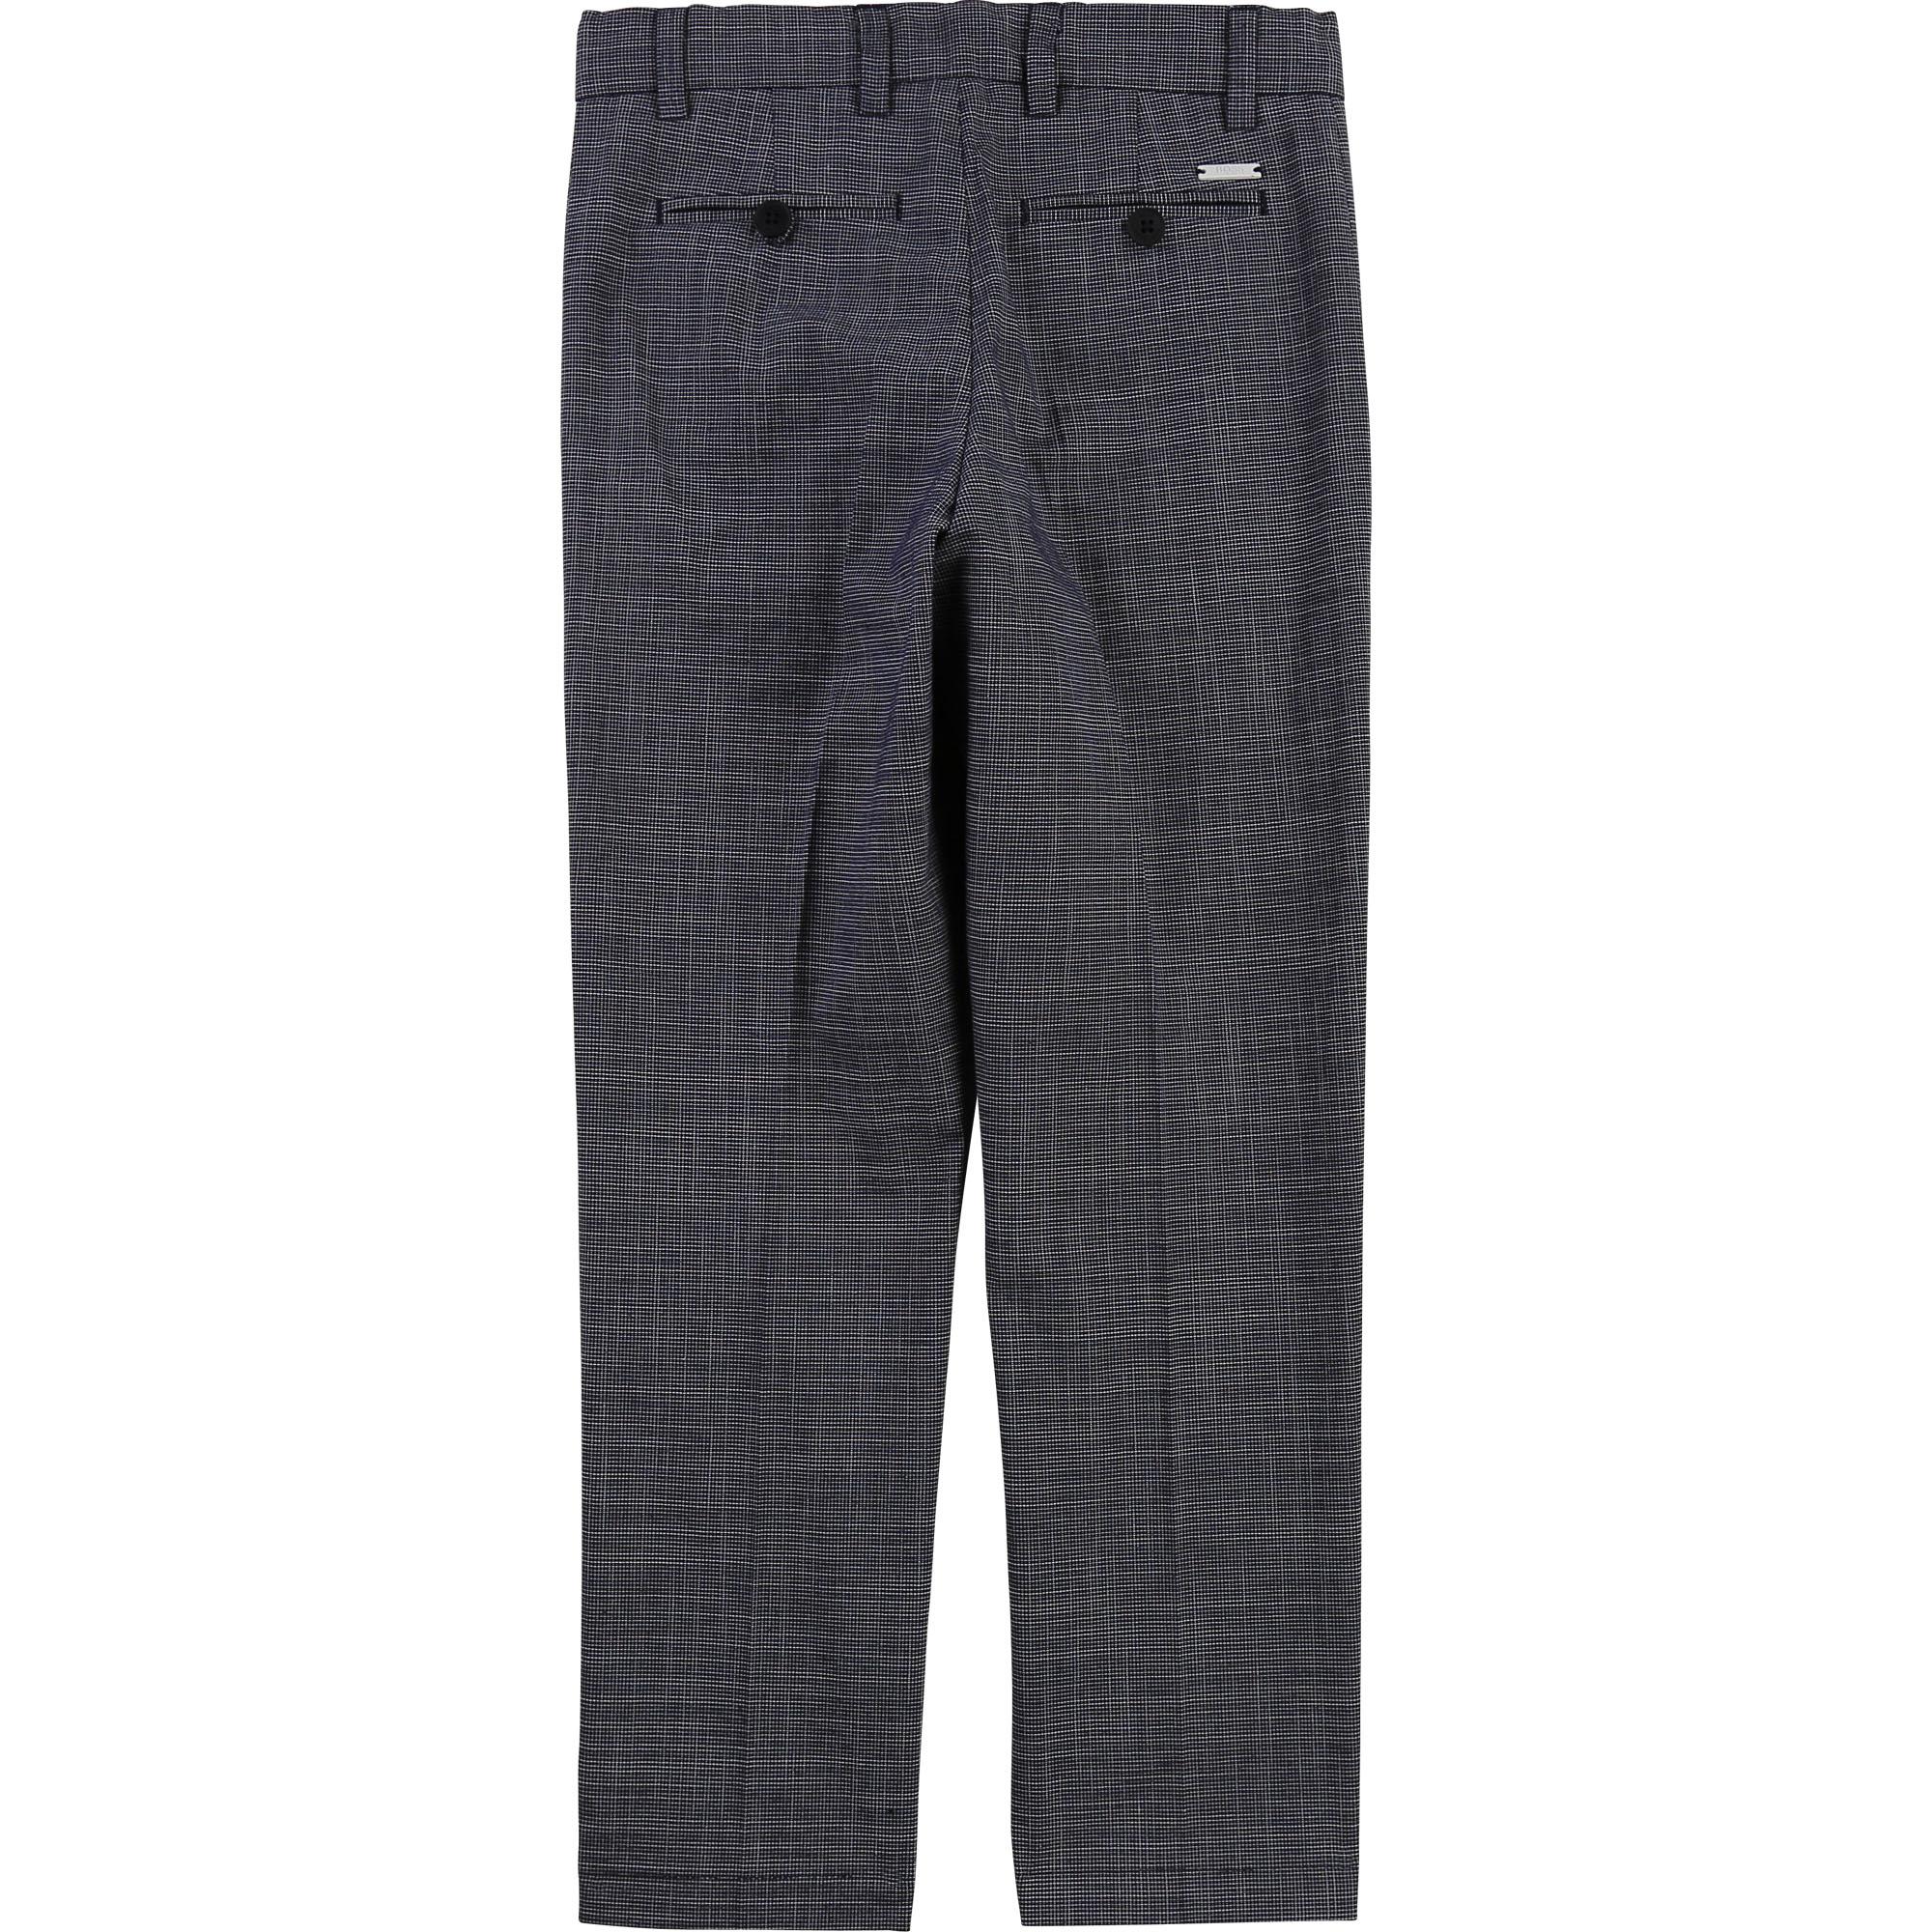 Pantalon de costume en coton BOSS pour GARCON